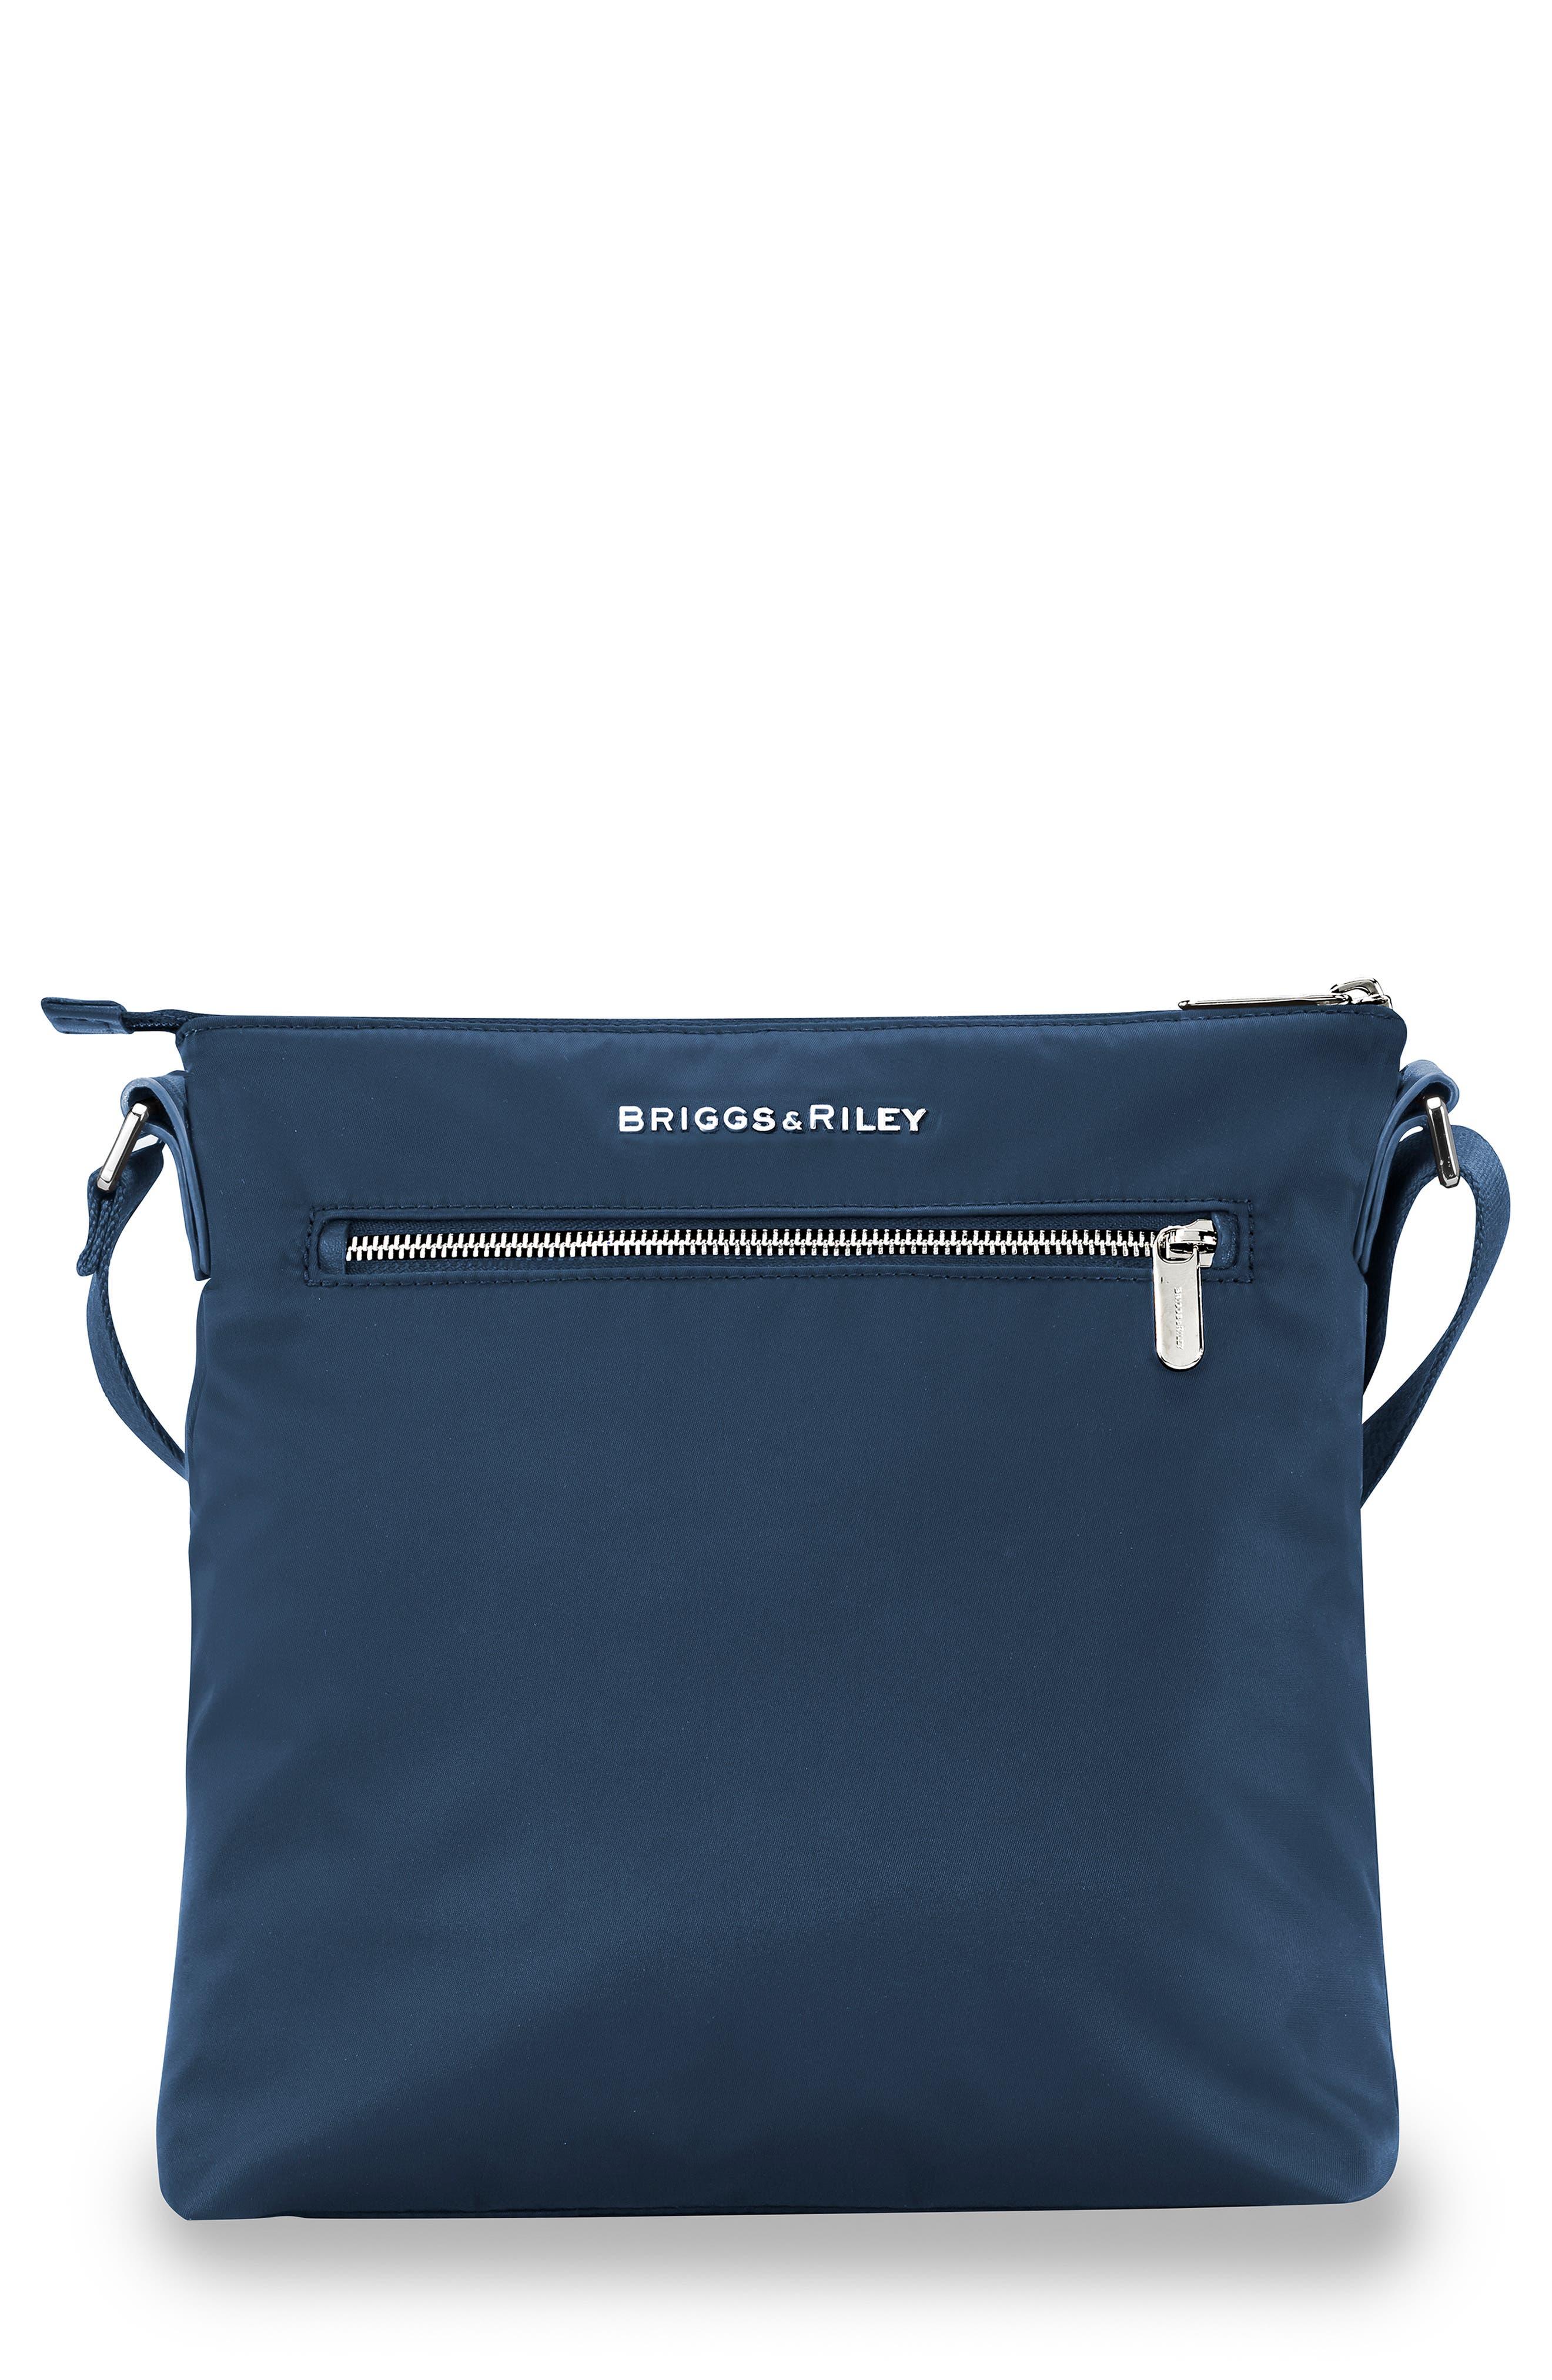 Rhapsody Water Resistant Nylon Crossbody Bag